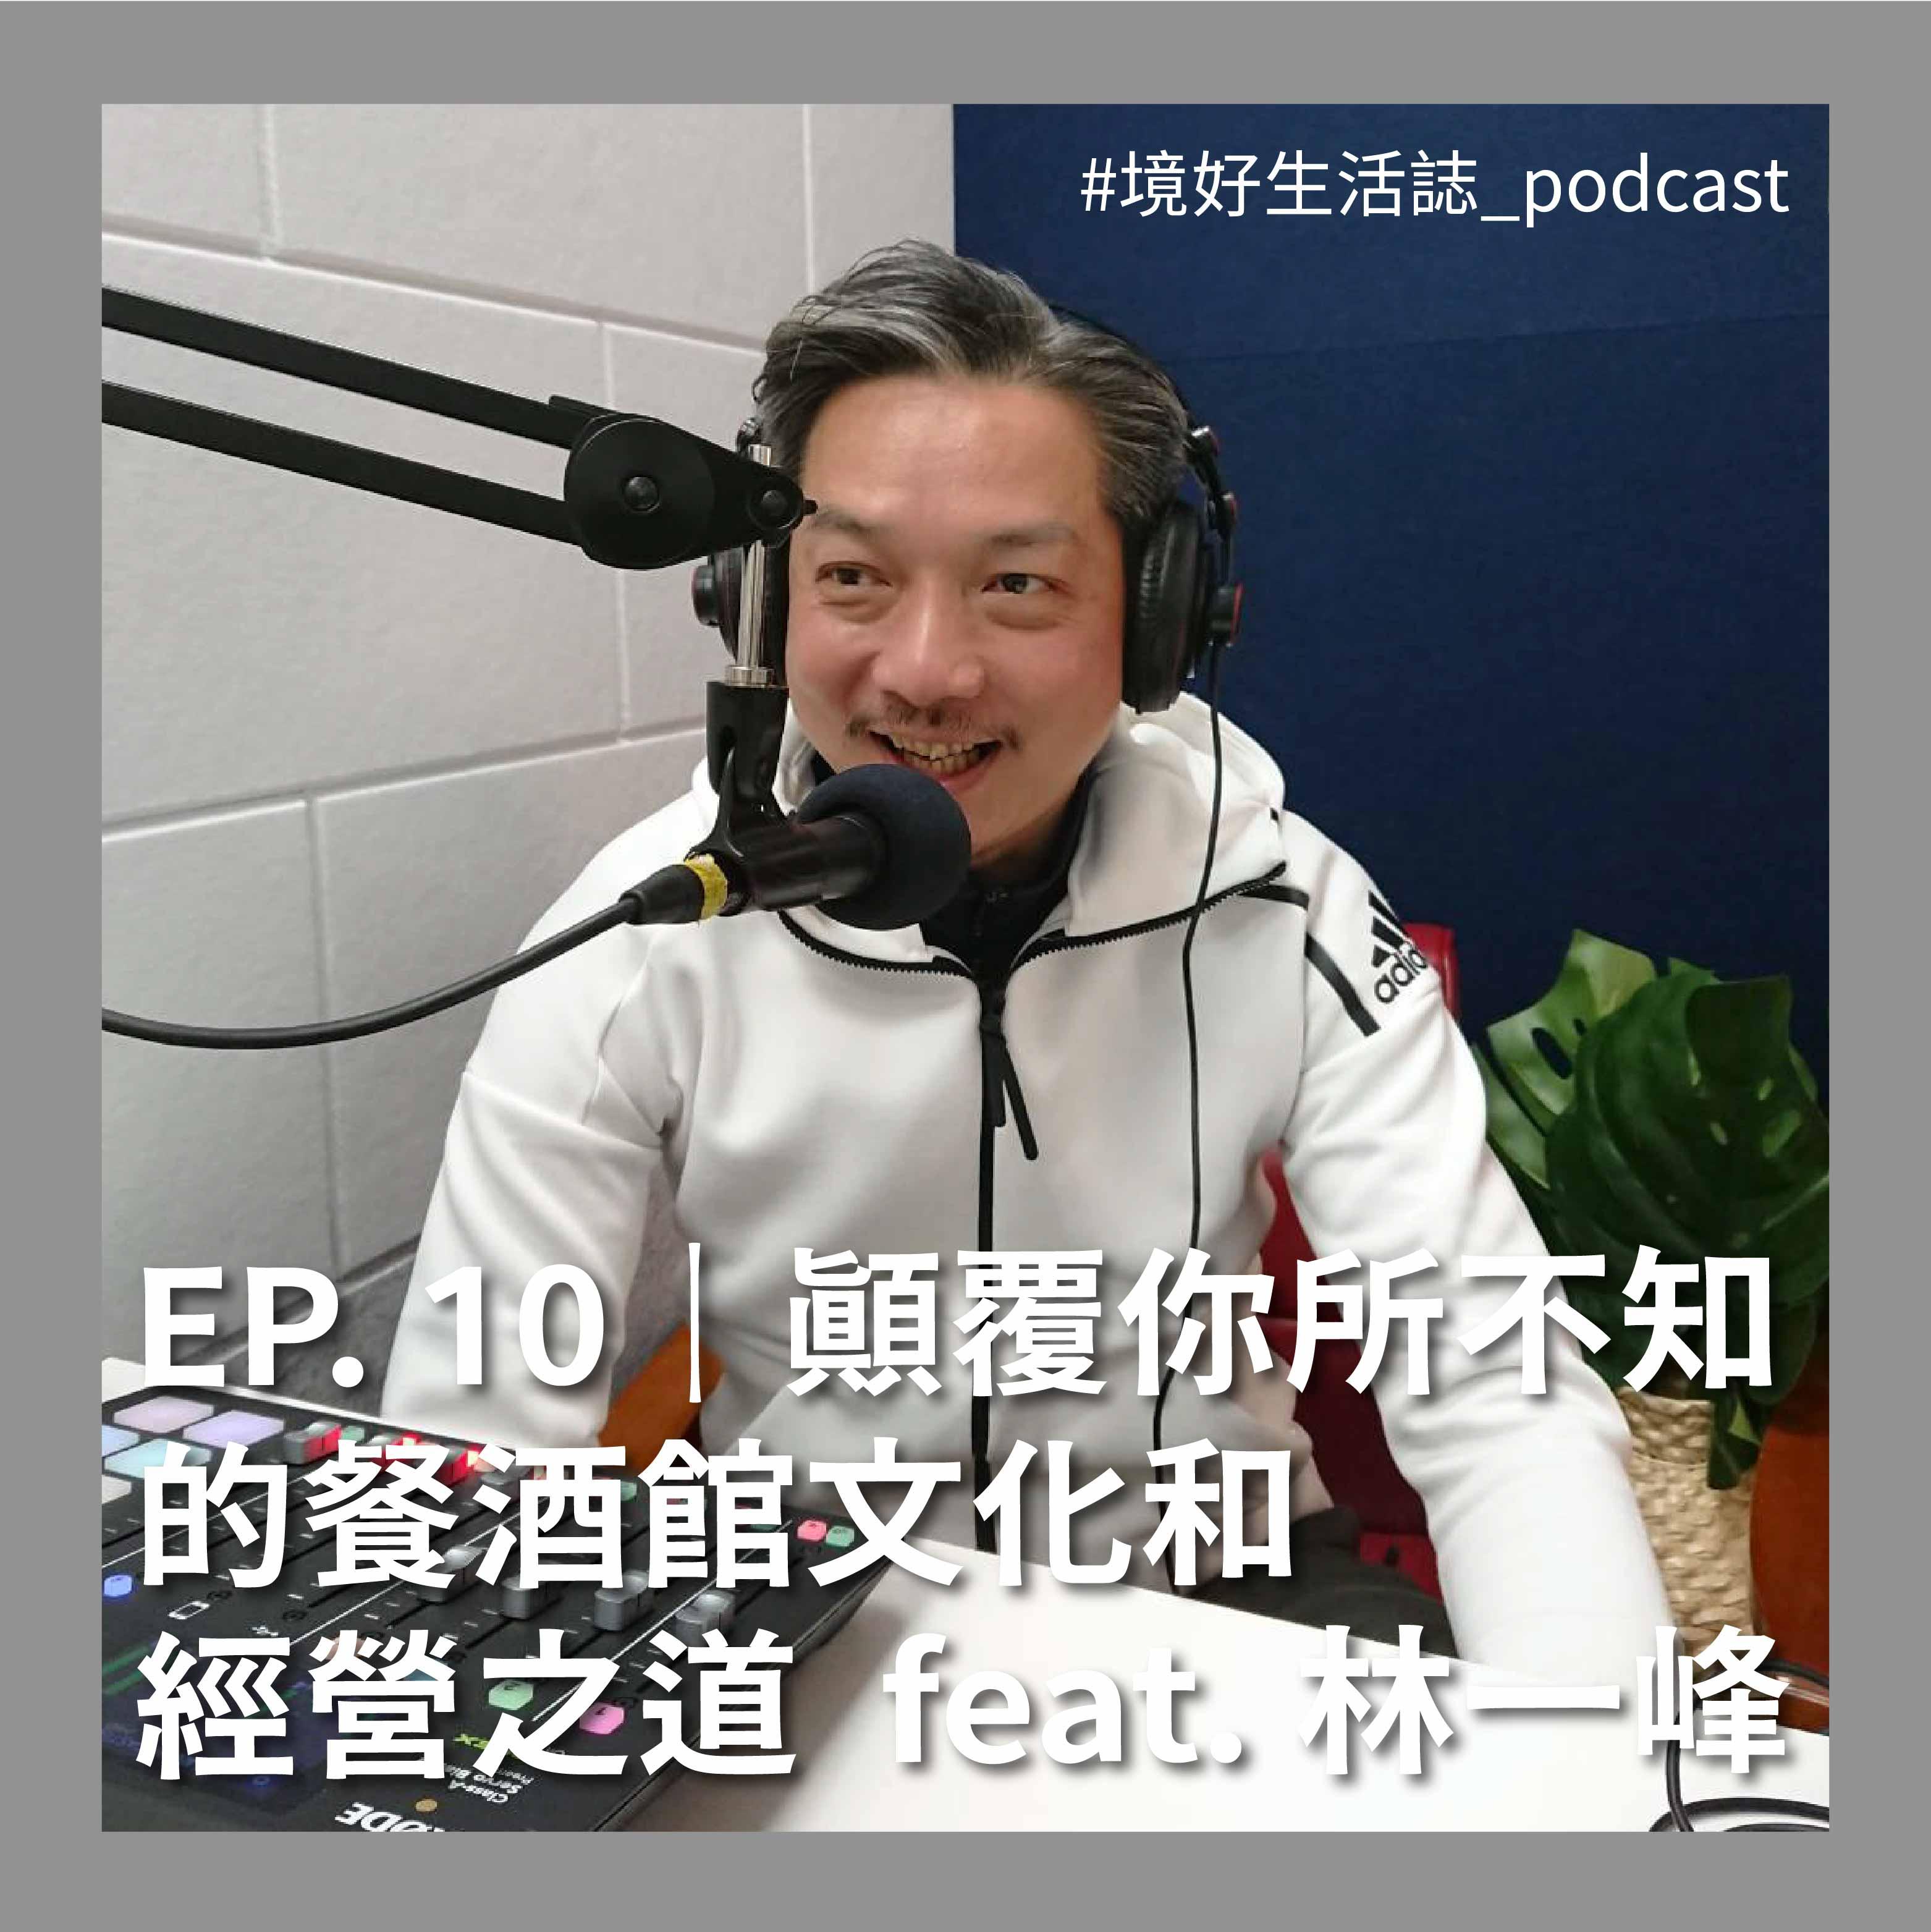 EP. 10|顛覆你所不知的餐酒館文化和經營之道  feat. 林一峰